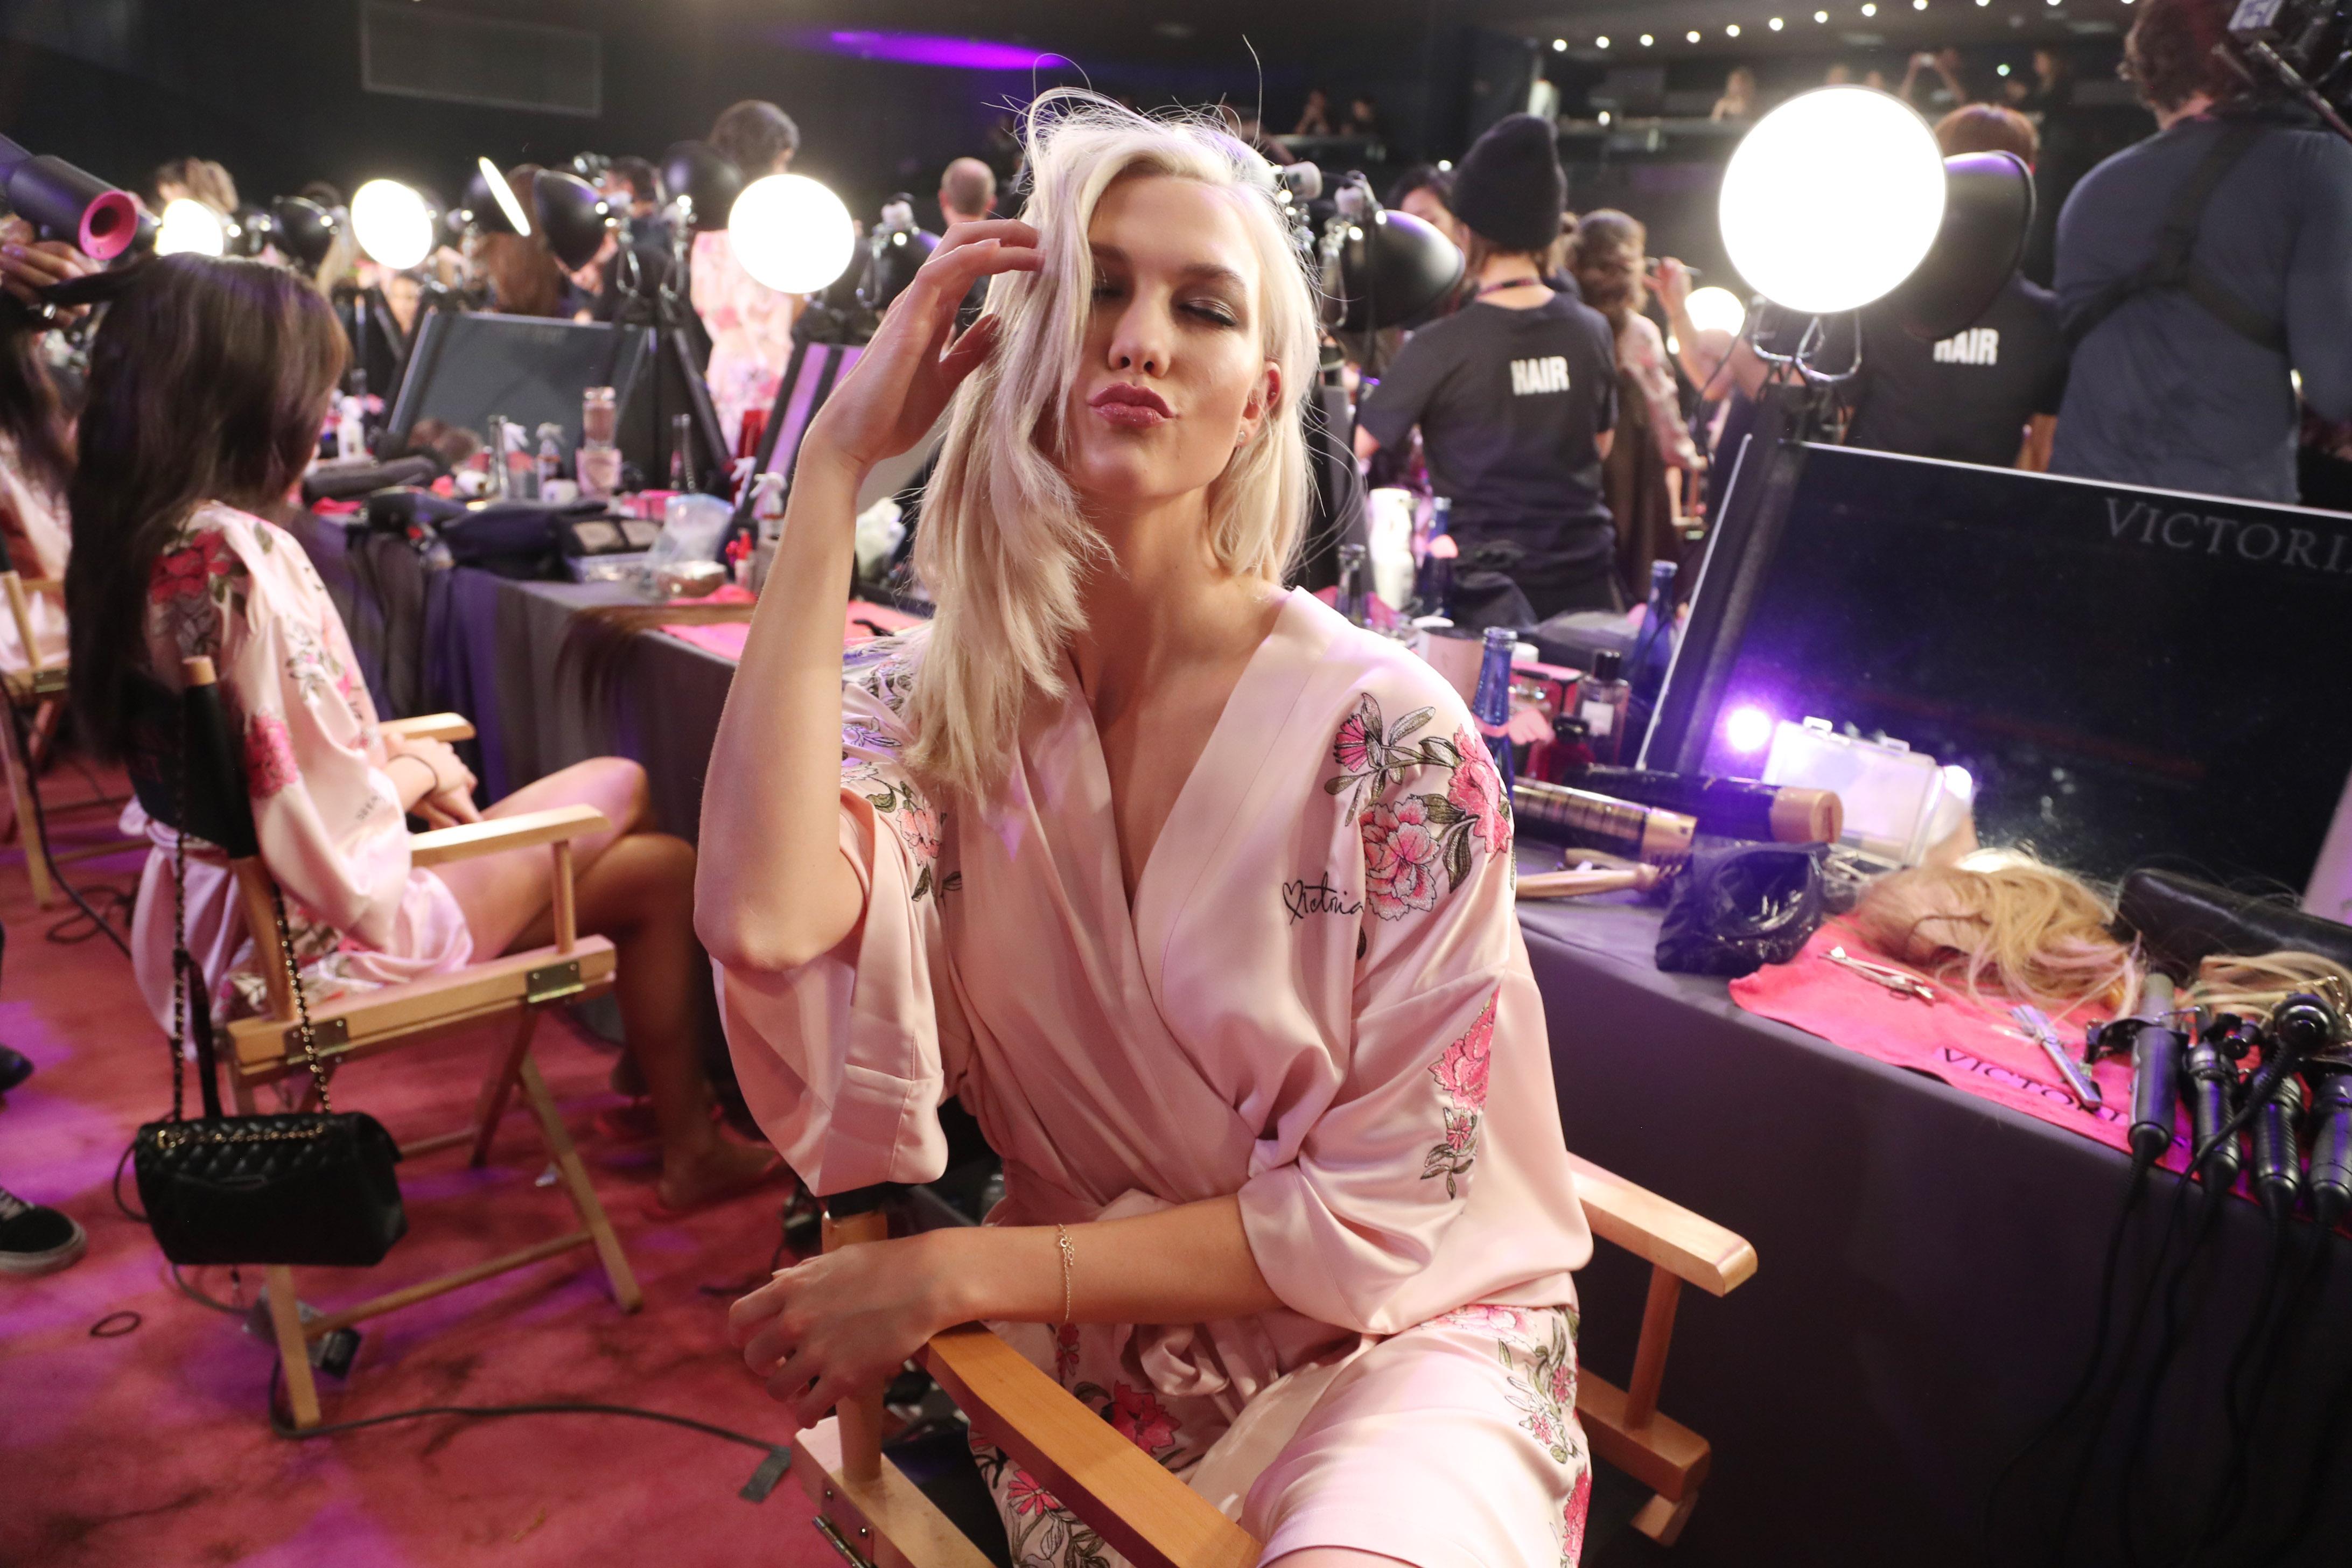 Karlie KlossVictoria's Secret Fashion Show, Backstage, Shanghai, China - 20 Nov 2017